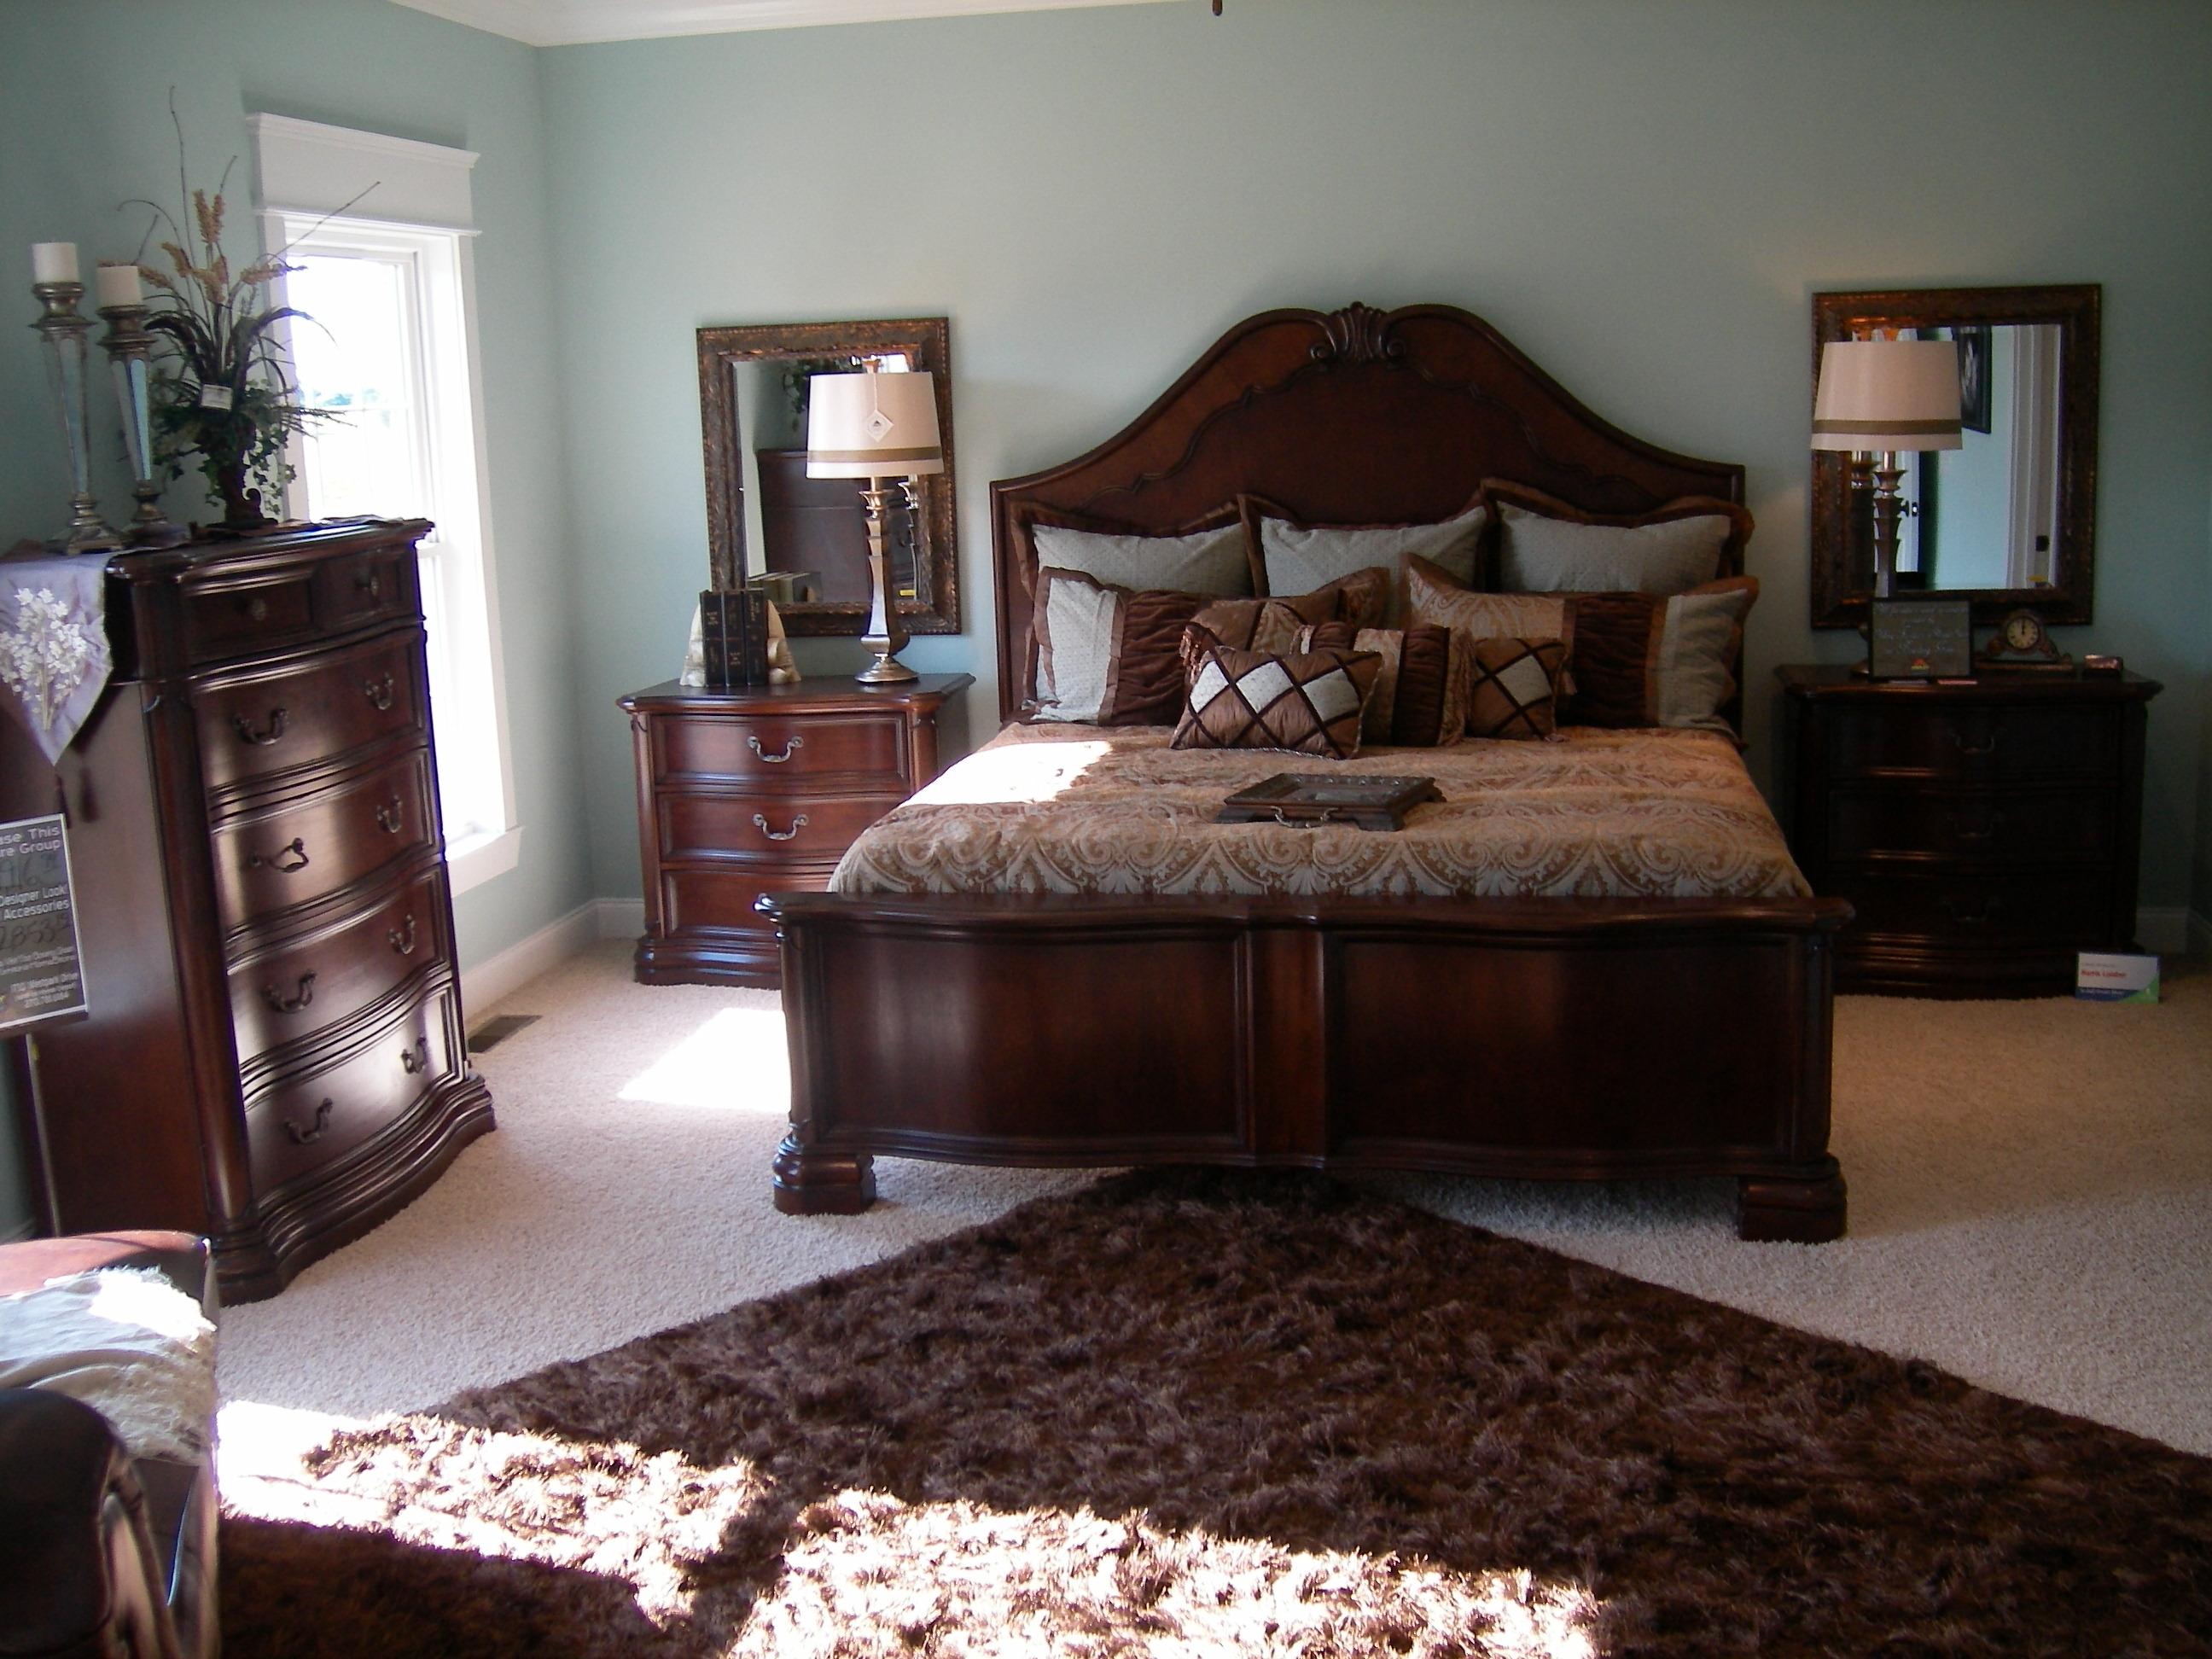 Ashley Furniture HomeStore Donates 5000 To St Jude